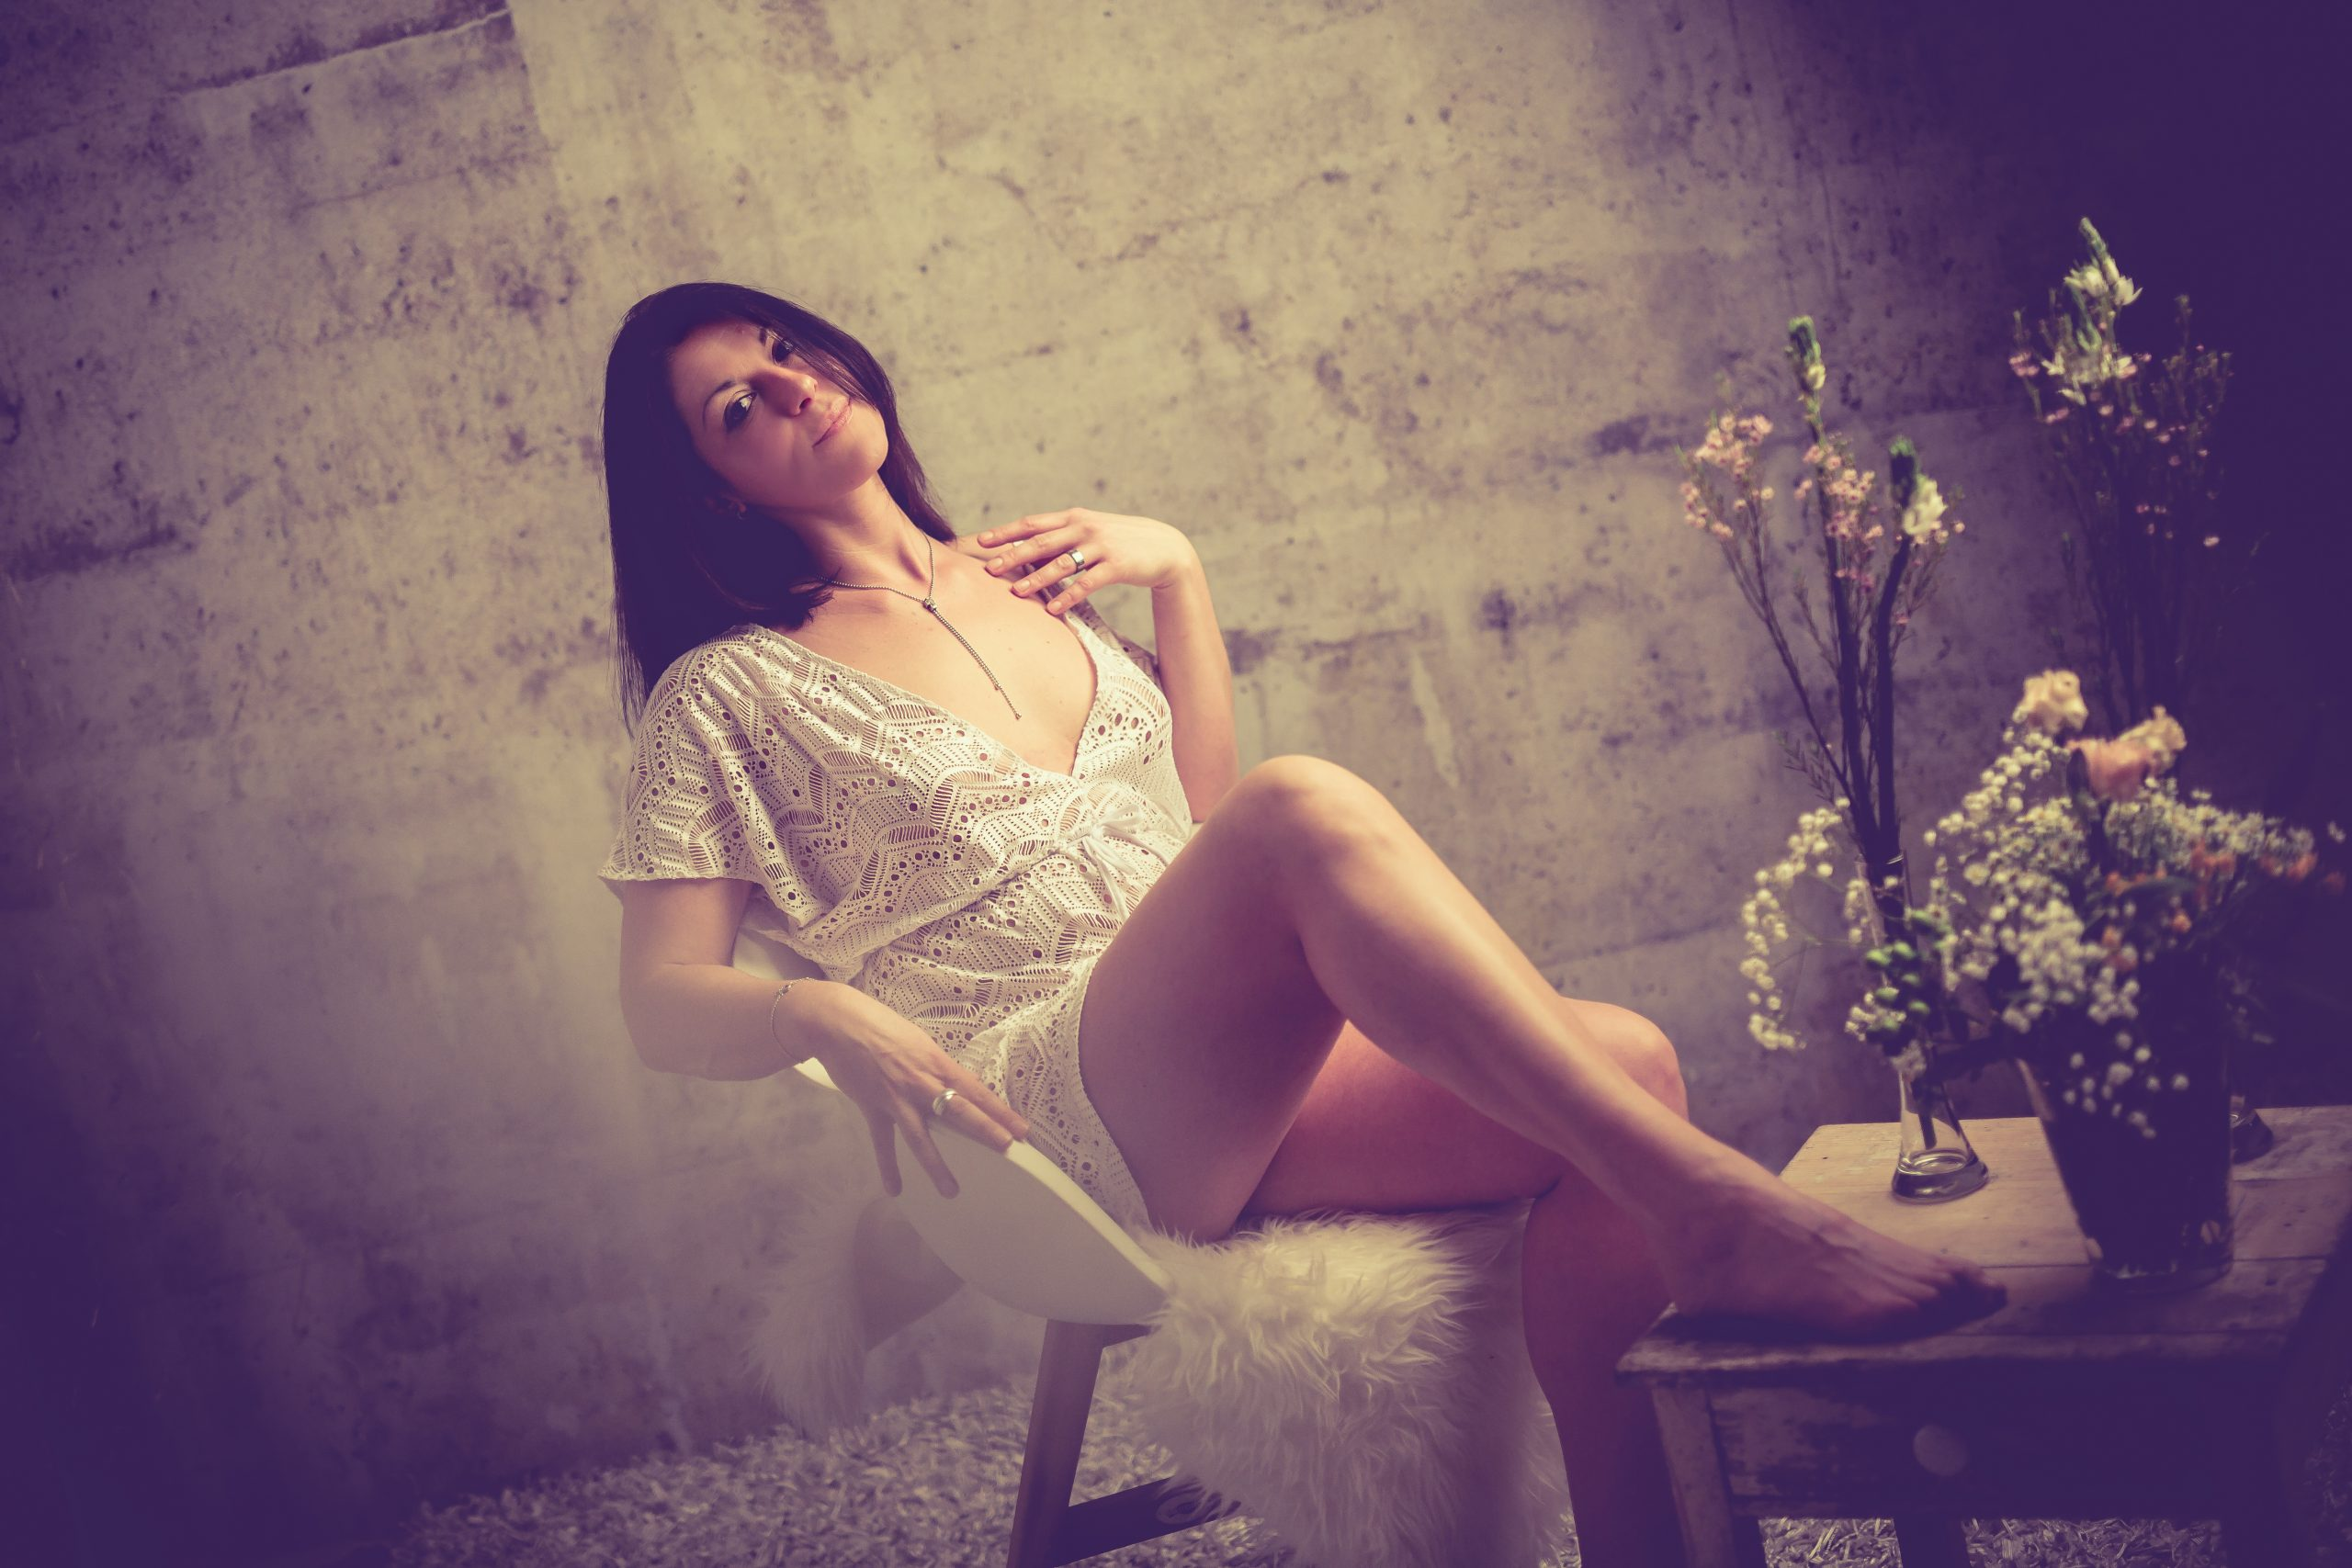 BEAUTY-und-BOUDOIR-aachen-erotikshooting-dueren-erotikfotos-alsdorf-erotikbilder-eschweiler-boudoirfotografie-aachen-Fotos-by-Domi-alsdorf-0175